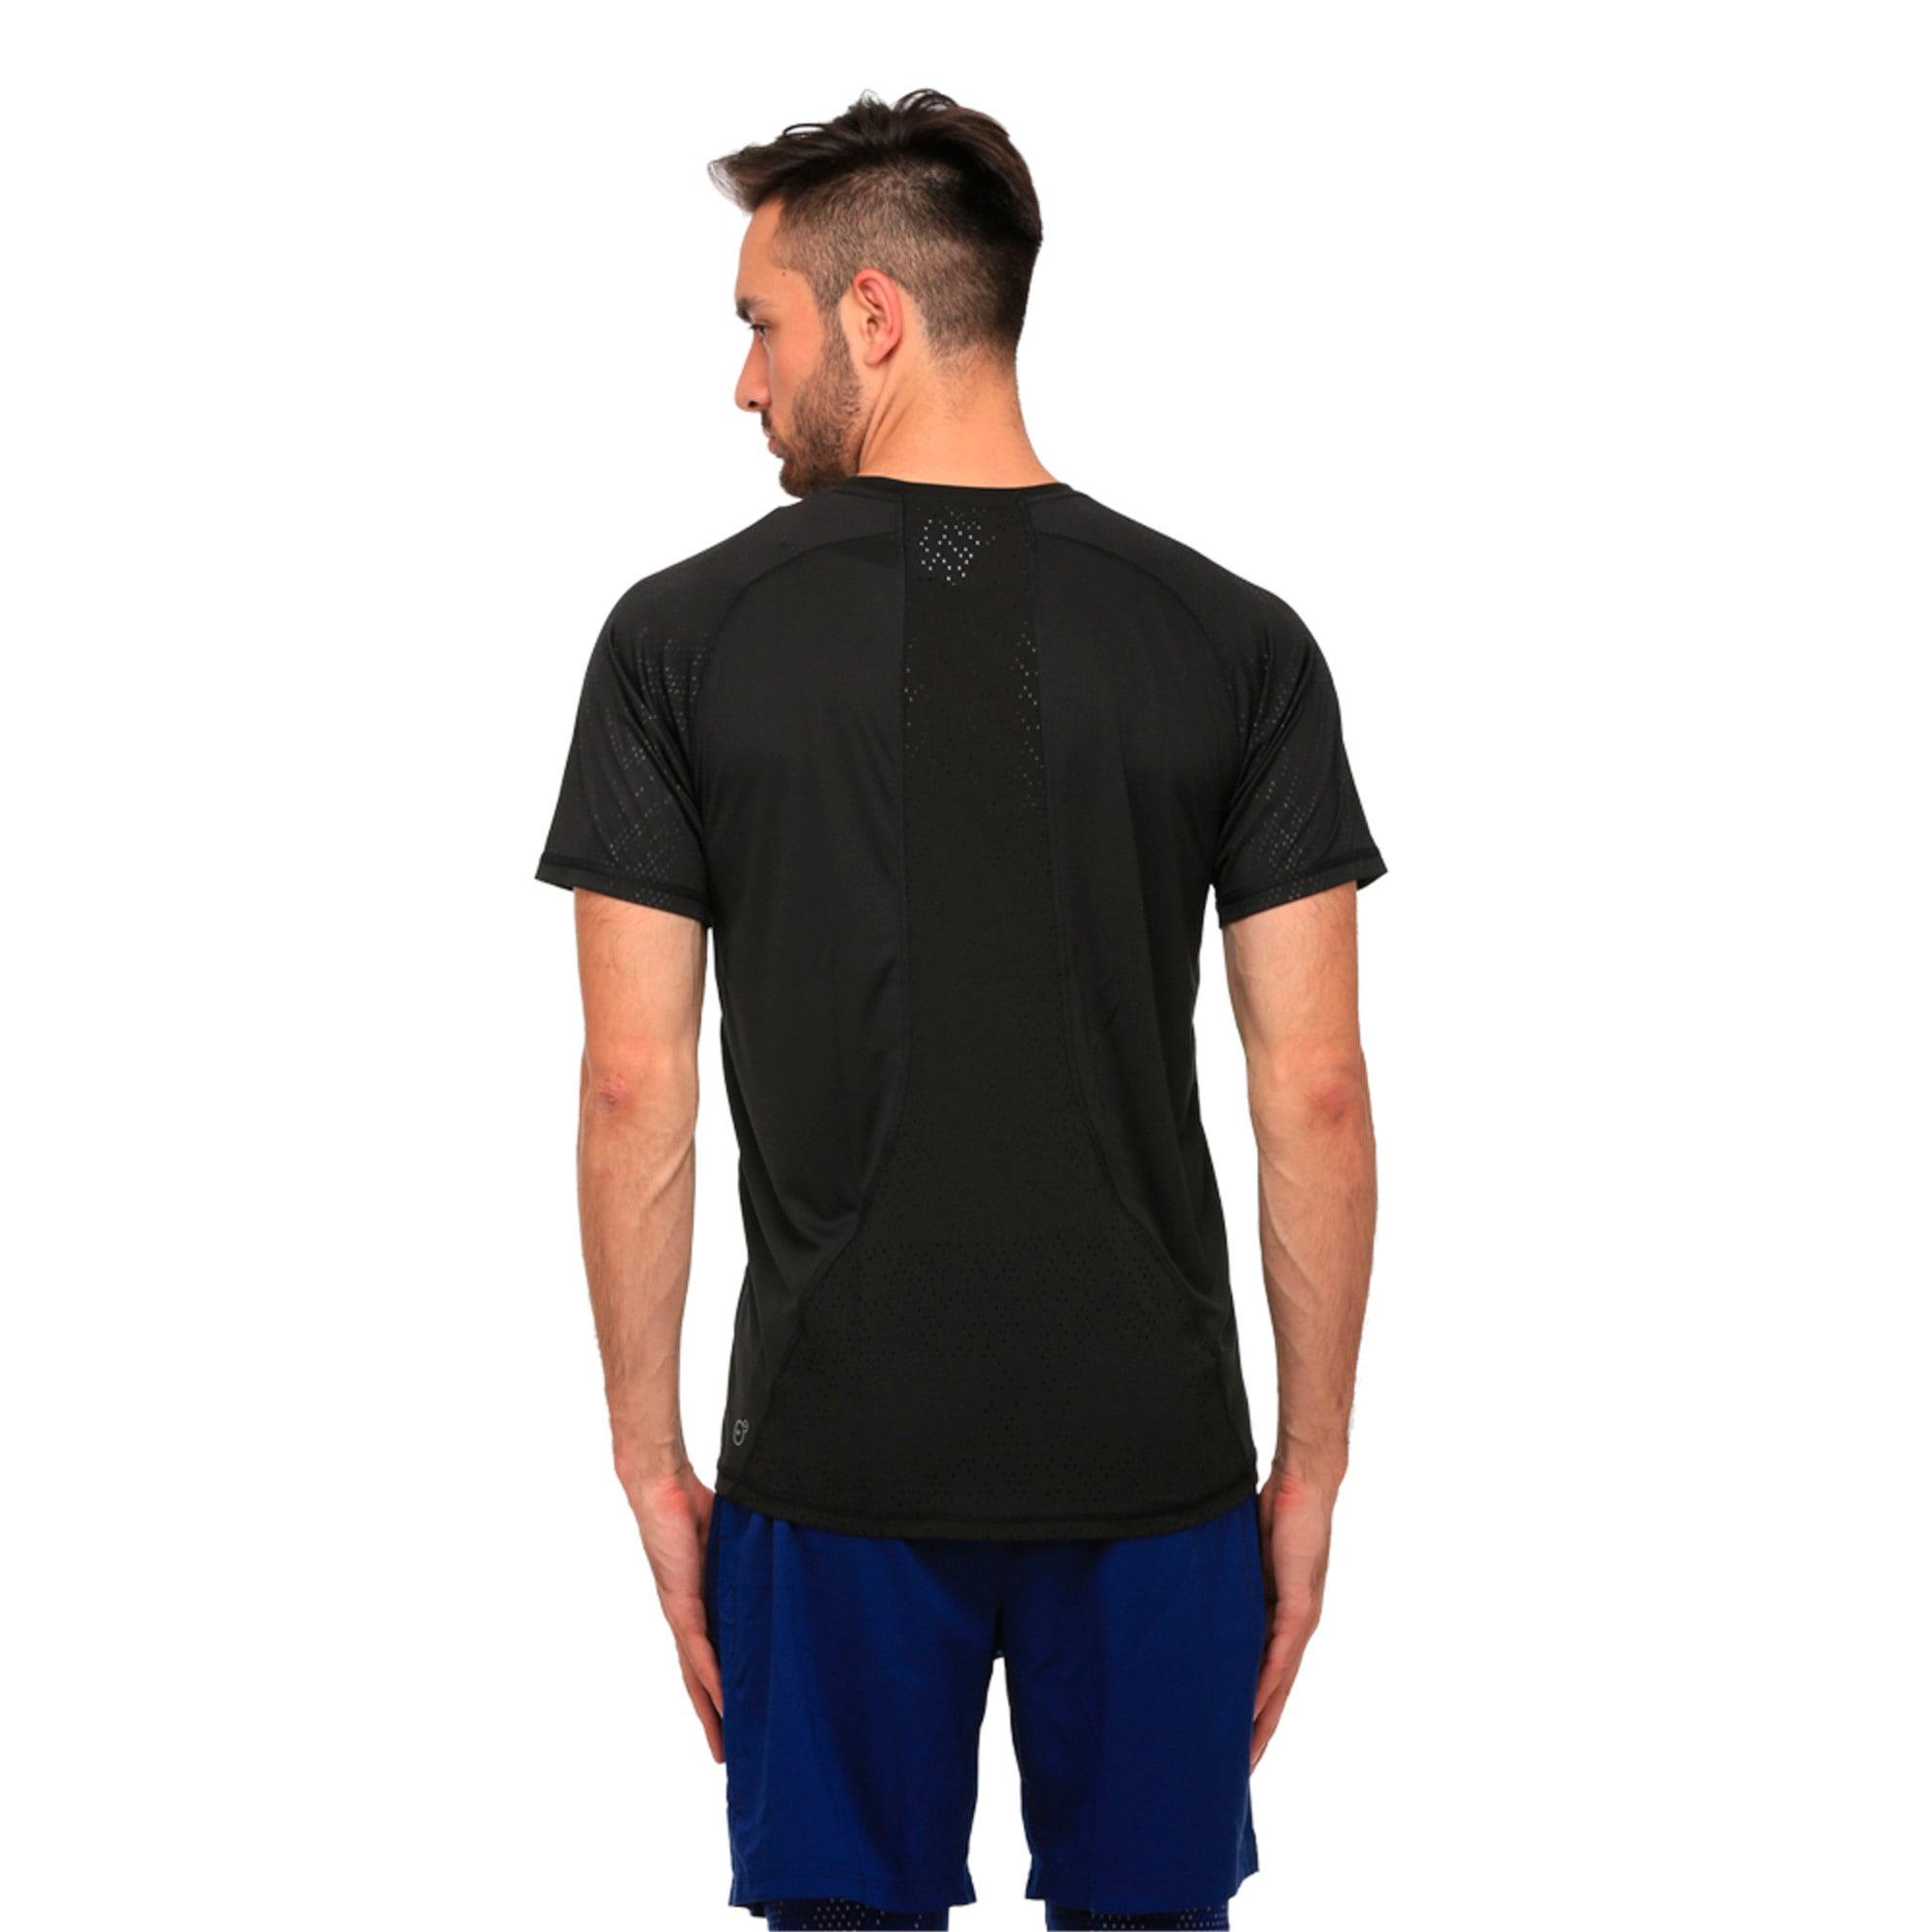 Thumbnail 2 of Active Training Men's Vent T-Shirt, Puma Black, medium-IND